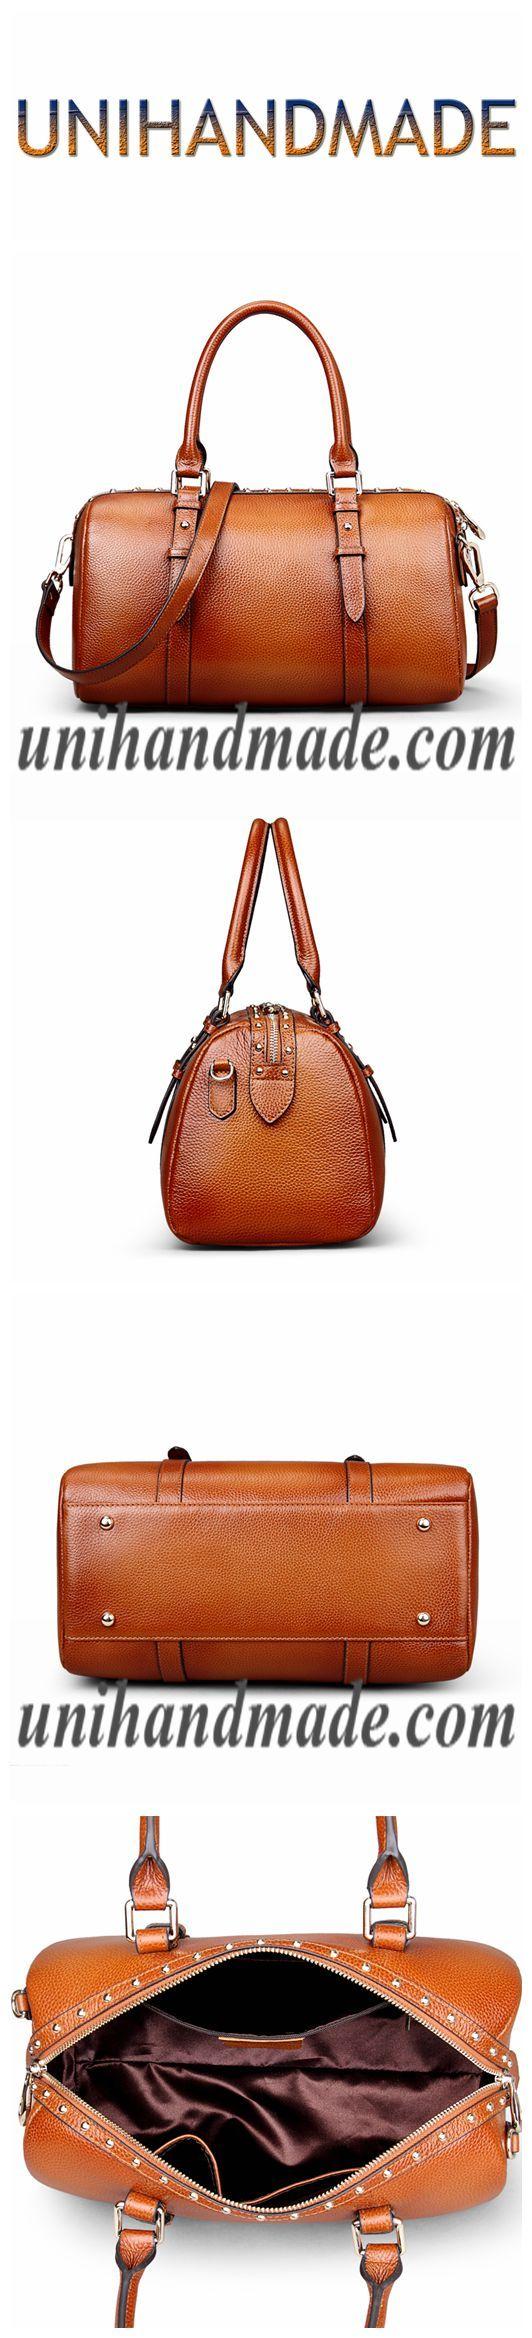 Wholesale Lady Fashion Handbag Designer Ladies Bags Genuine Leather Handbag SL9172